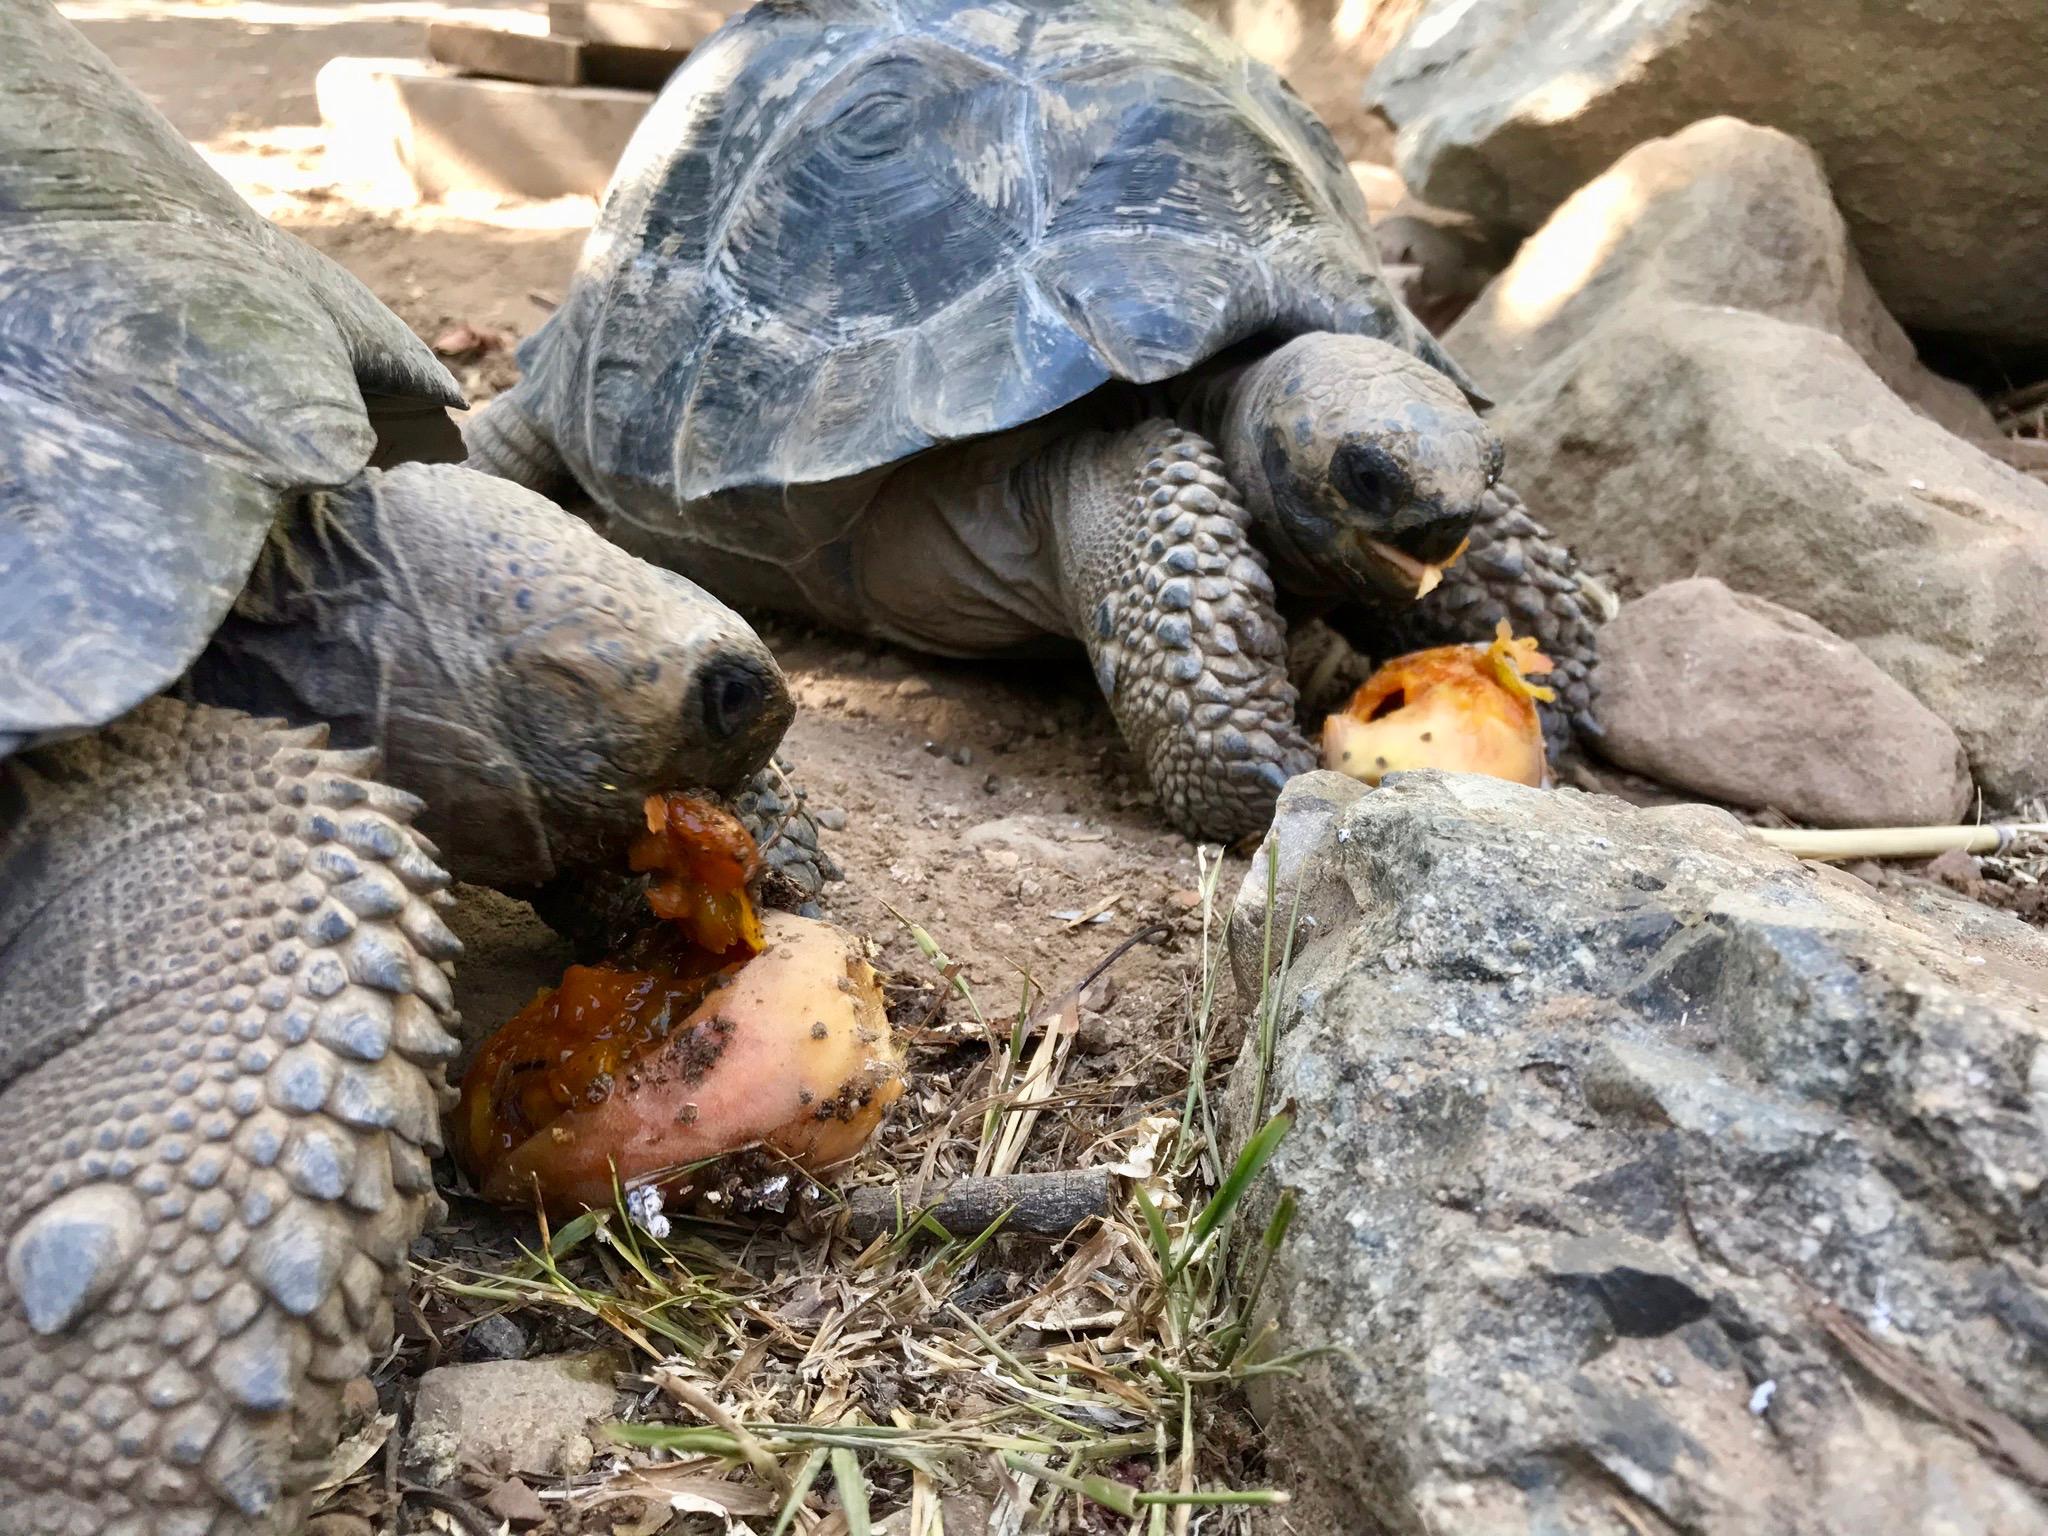 The Galapagos Tortoises are really enjoying the cactus fruiting season